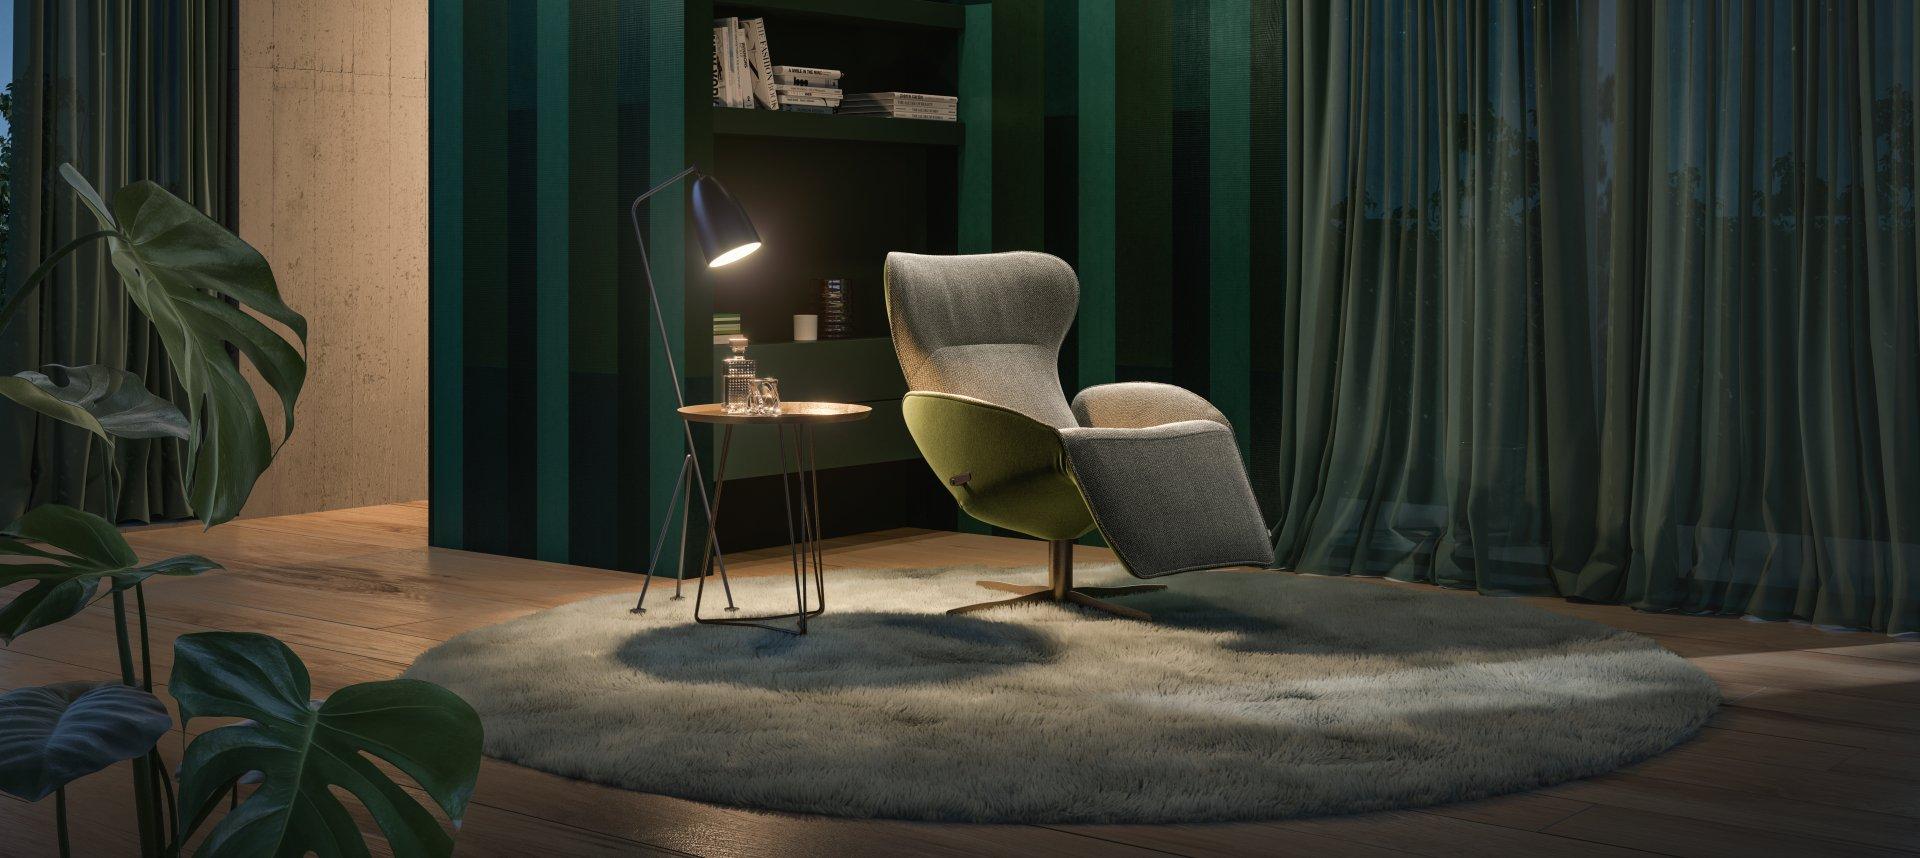 金宝搏手机登录Daydreamer-Lounge & relaxzetels